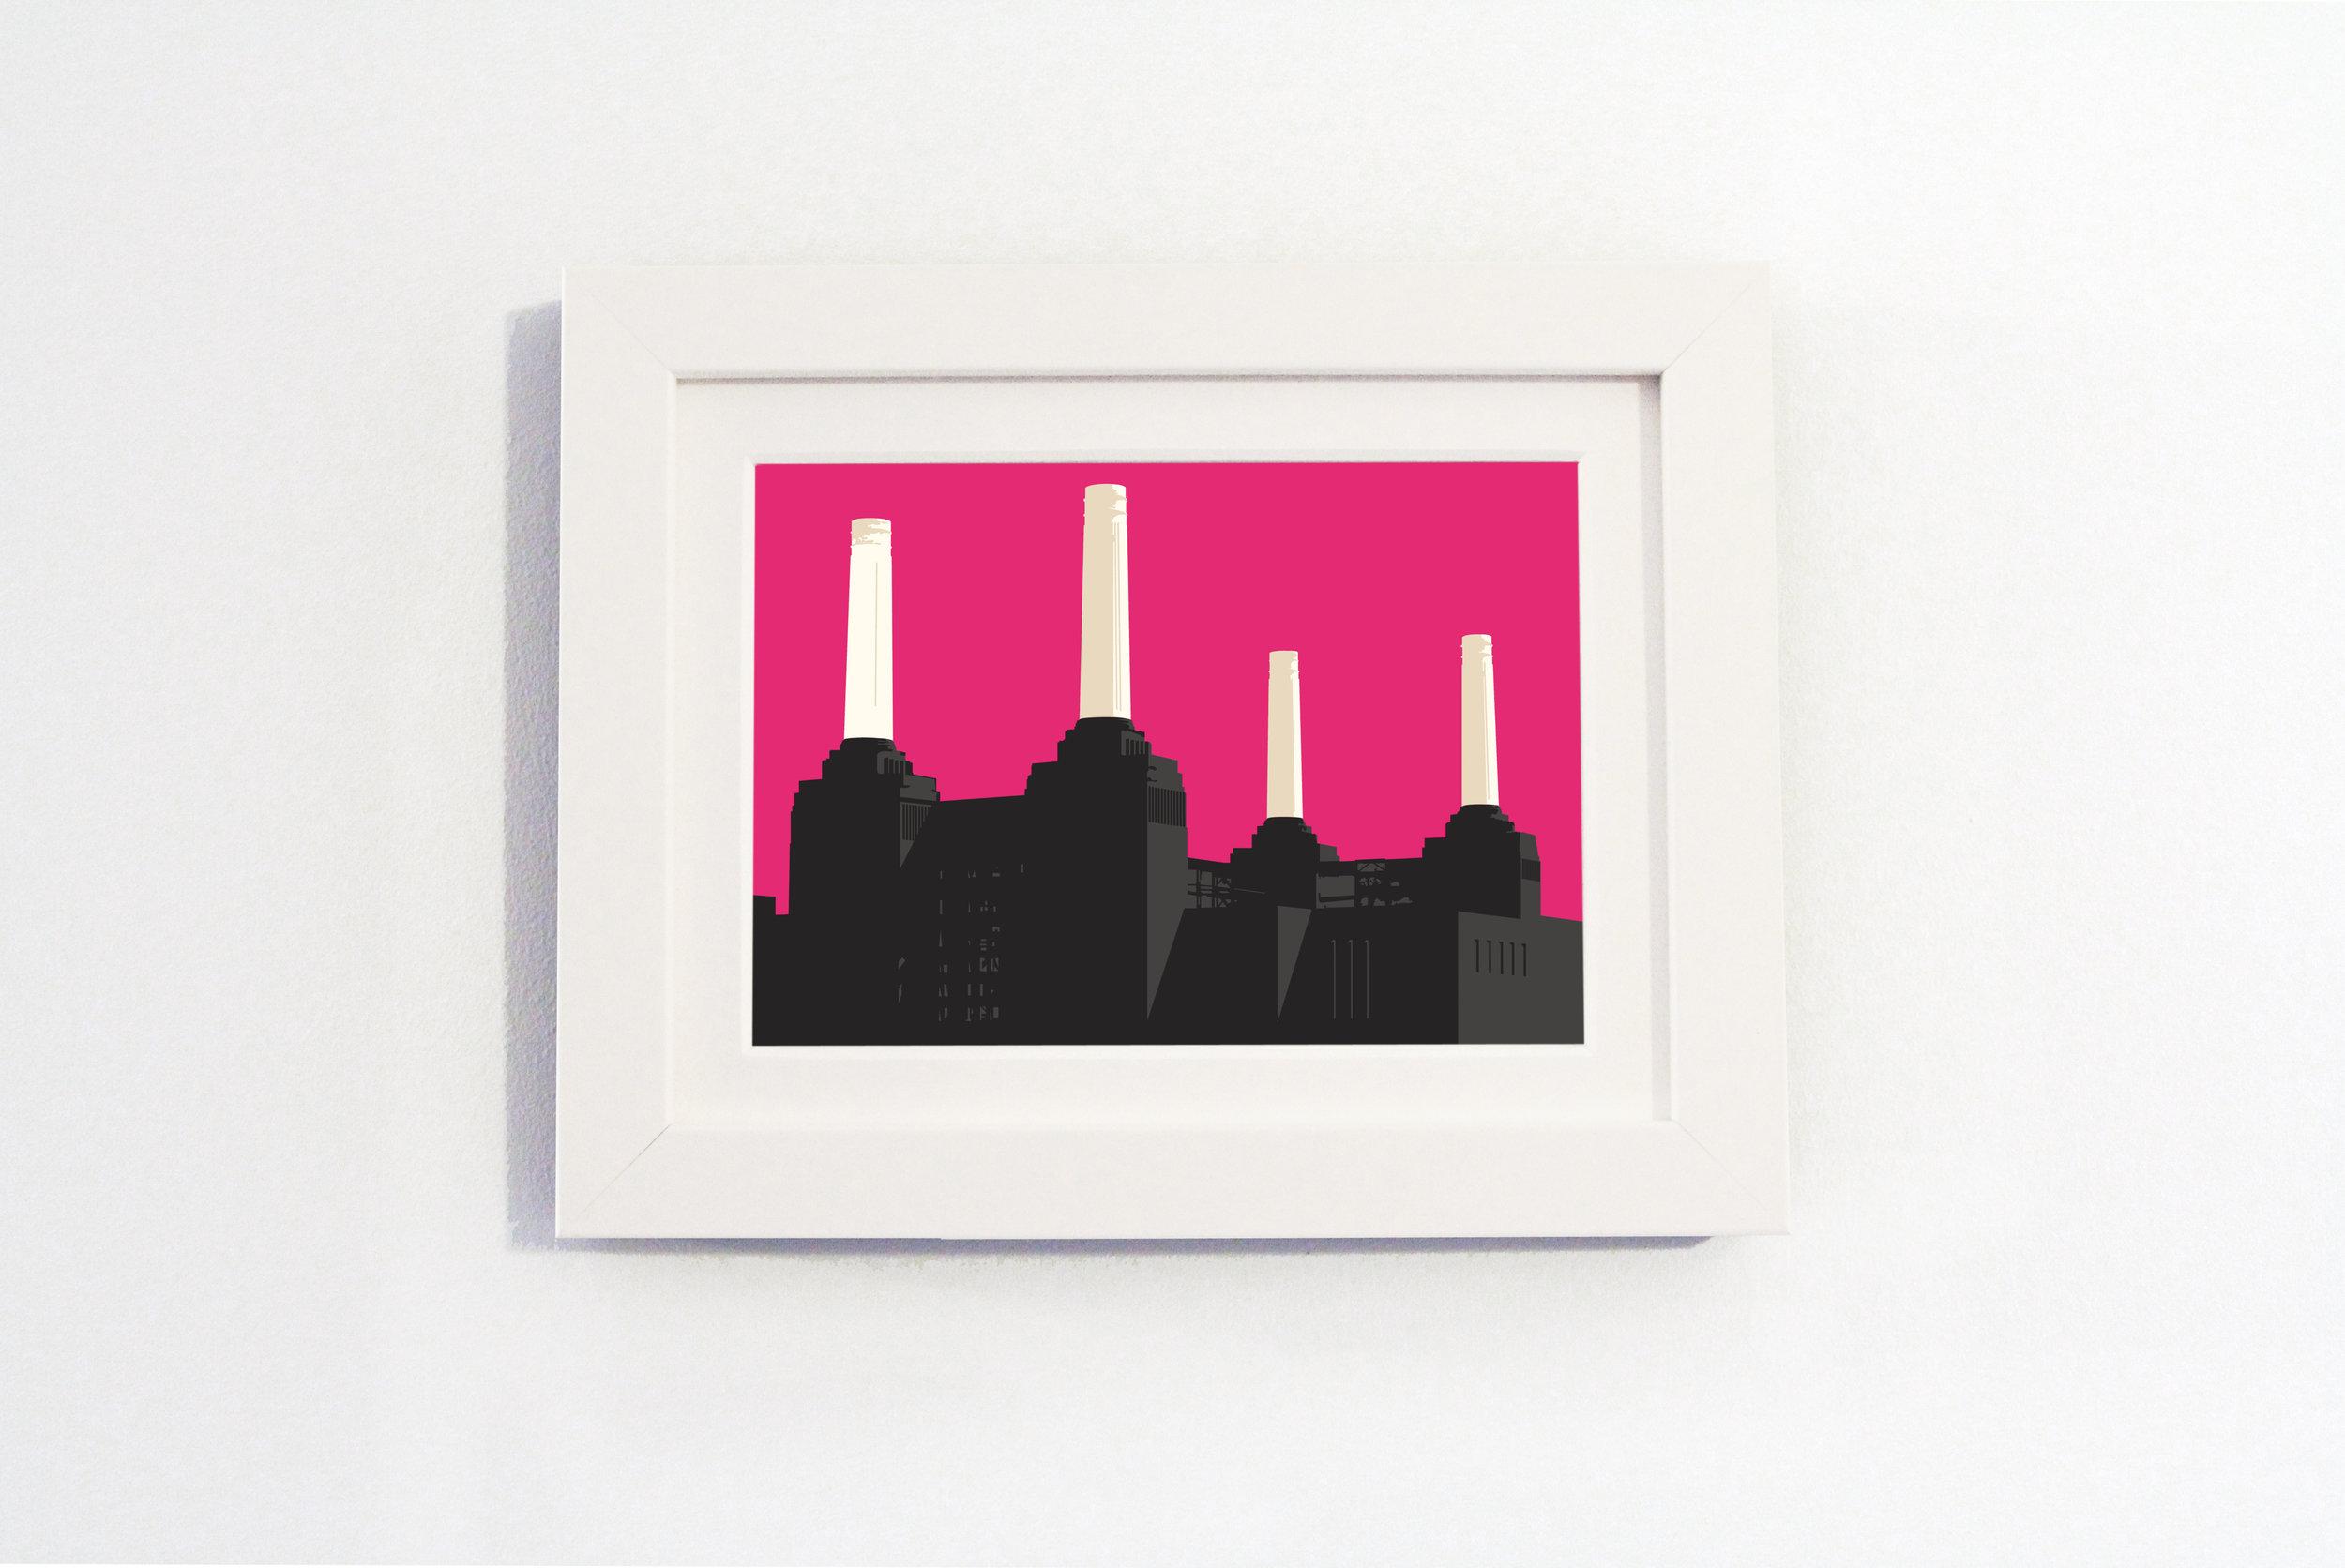 Battersea Pink White Frame.jpg